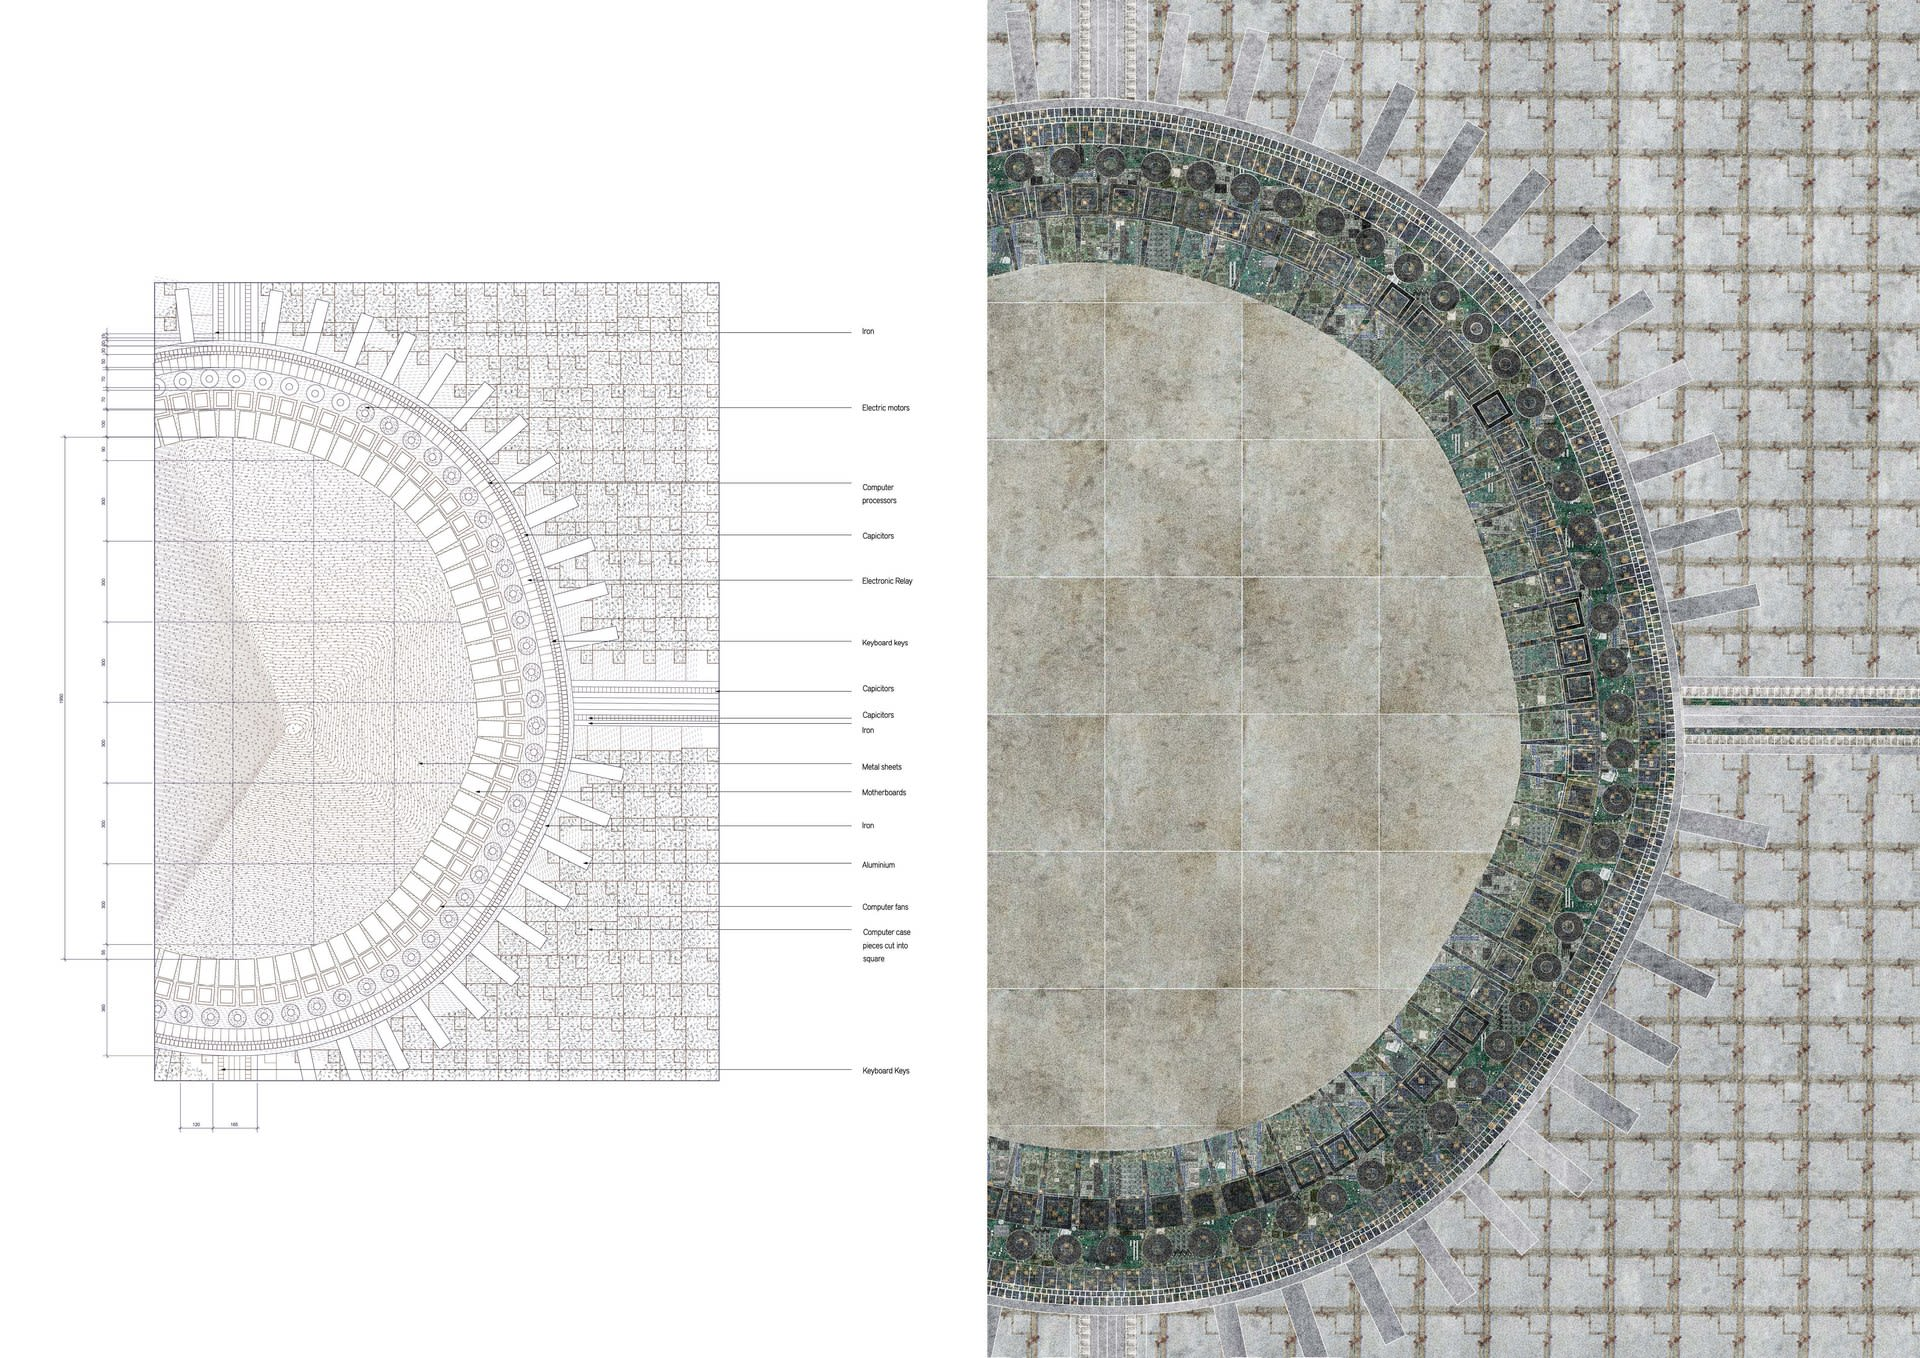 Plinth - Material detail